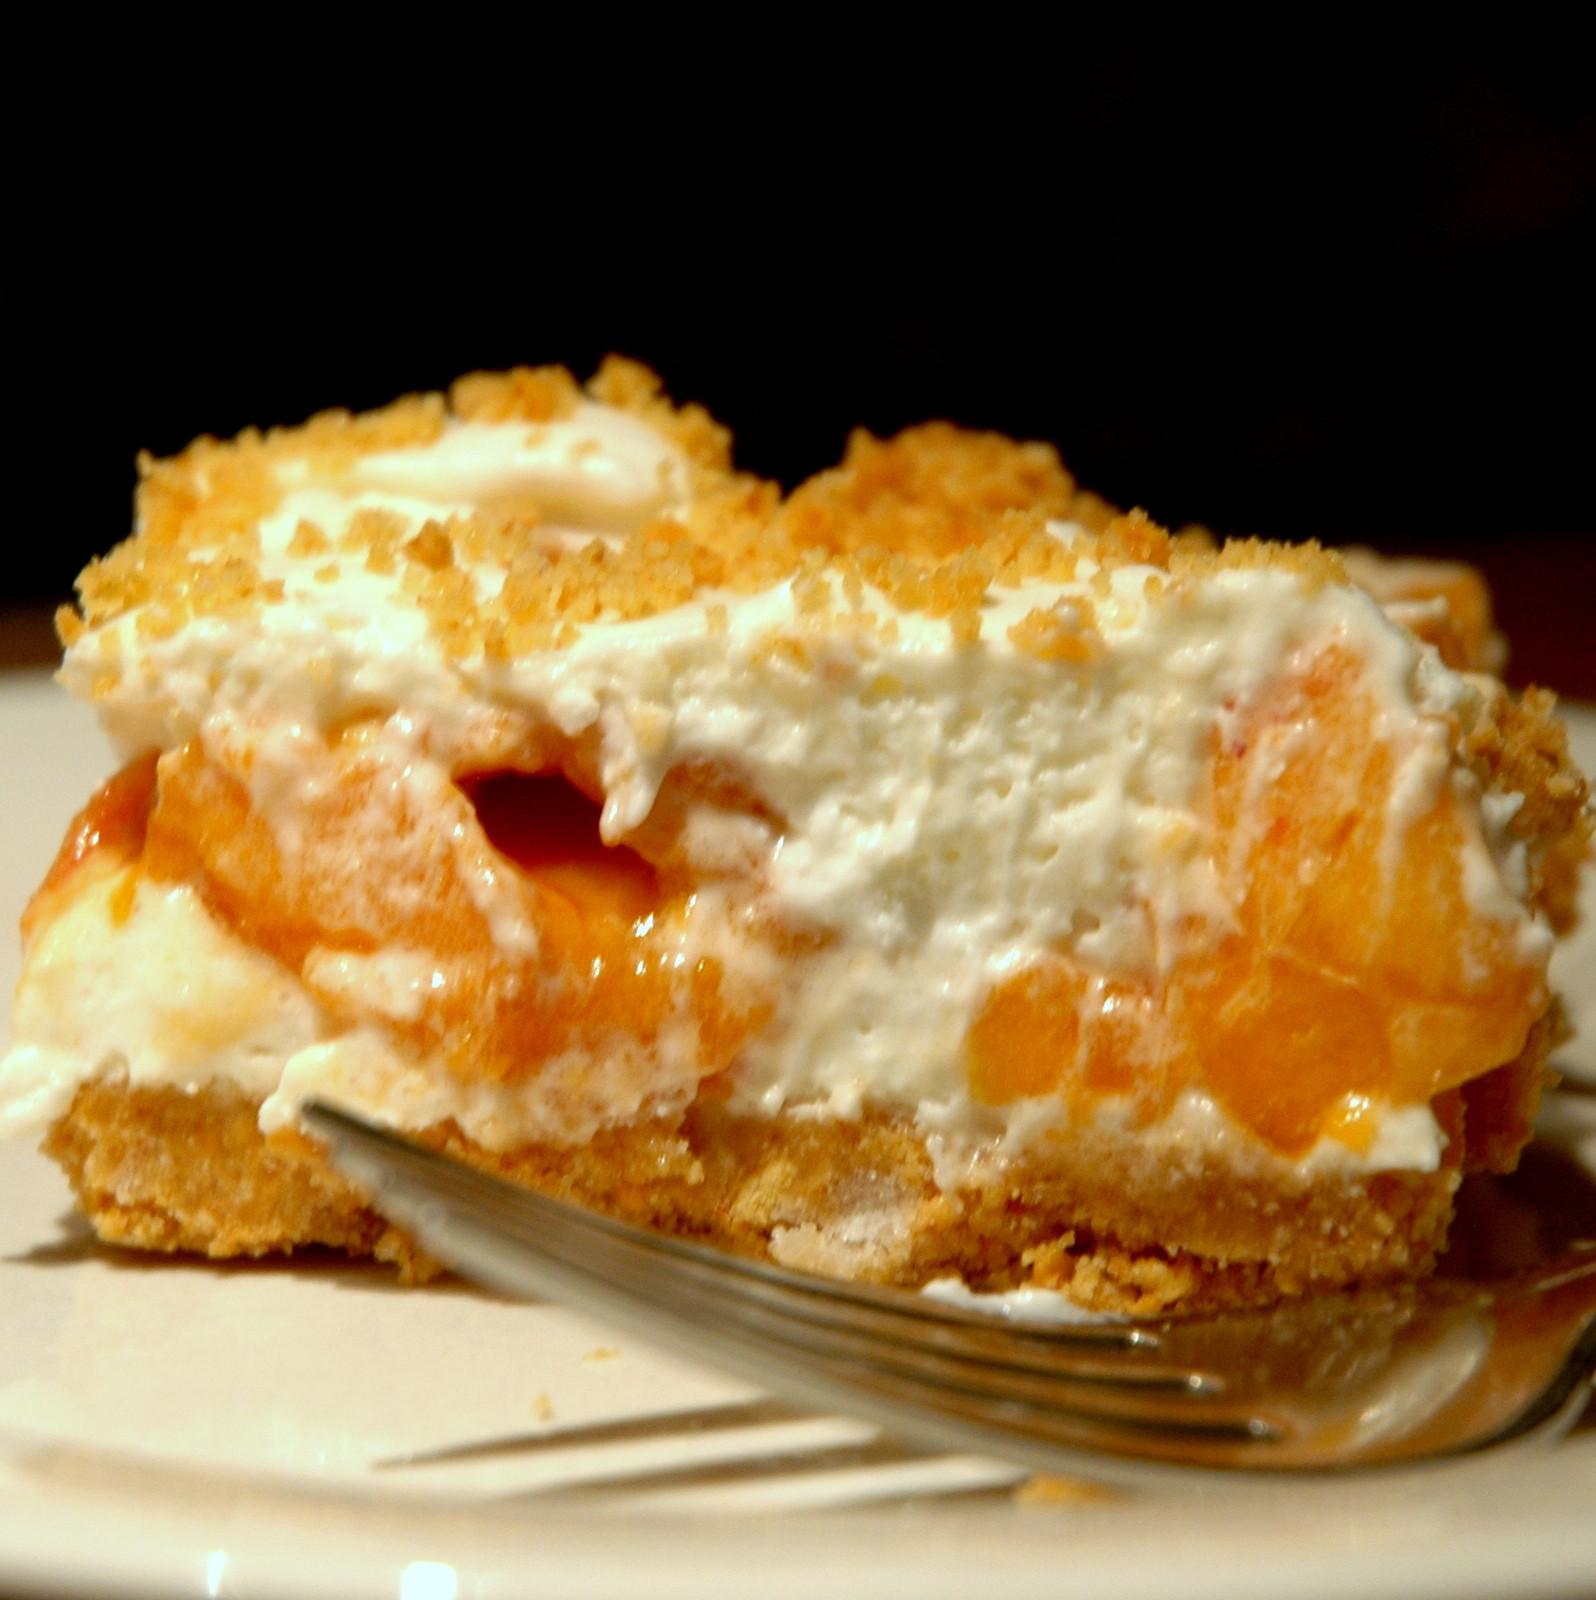 Fresh Peach Dessert Recipe  Cindy s Recipe Box Fresh Peach Dessert